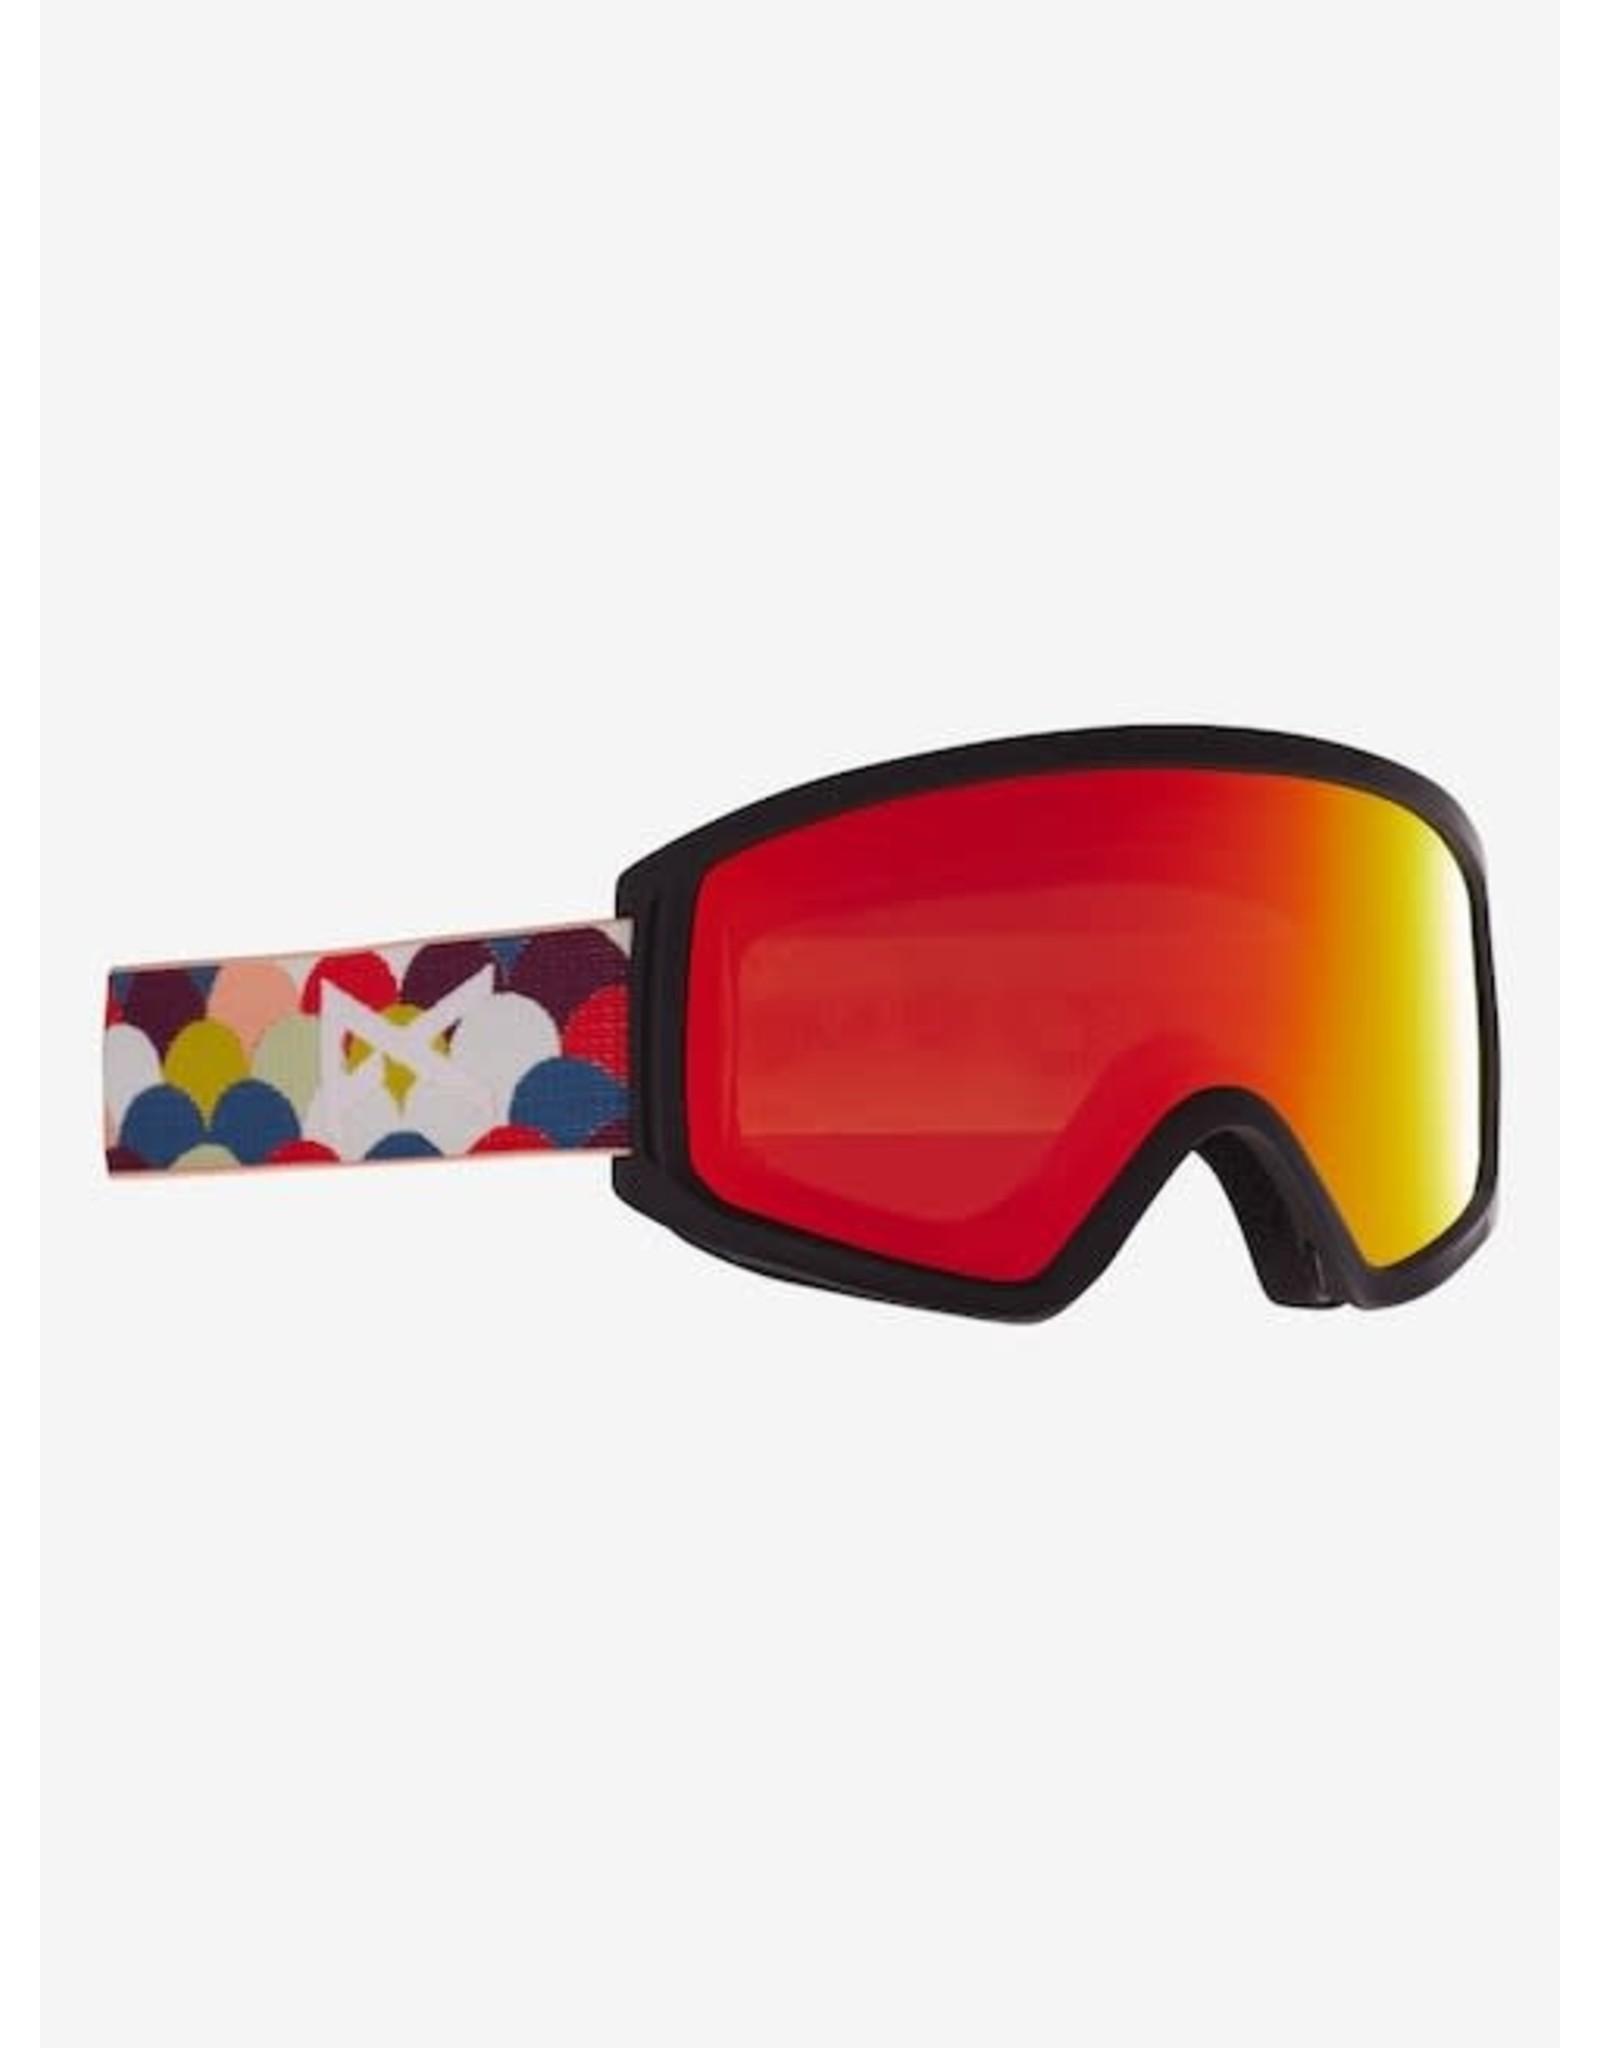 Anon Anon - Lunette snowboard junior tracker 2.0 rainbow black/red solex lens